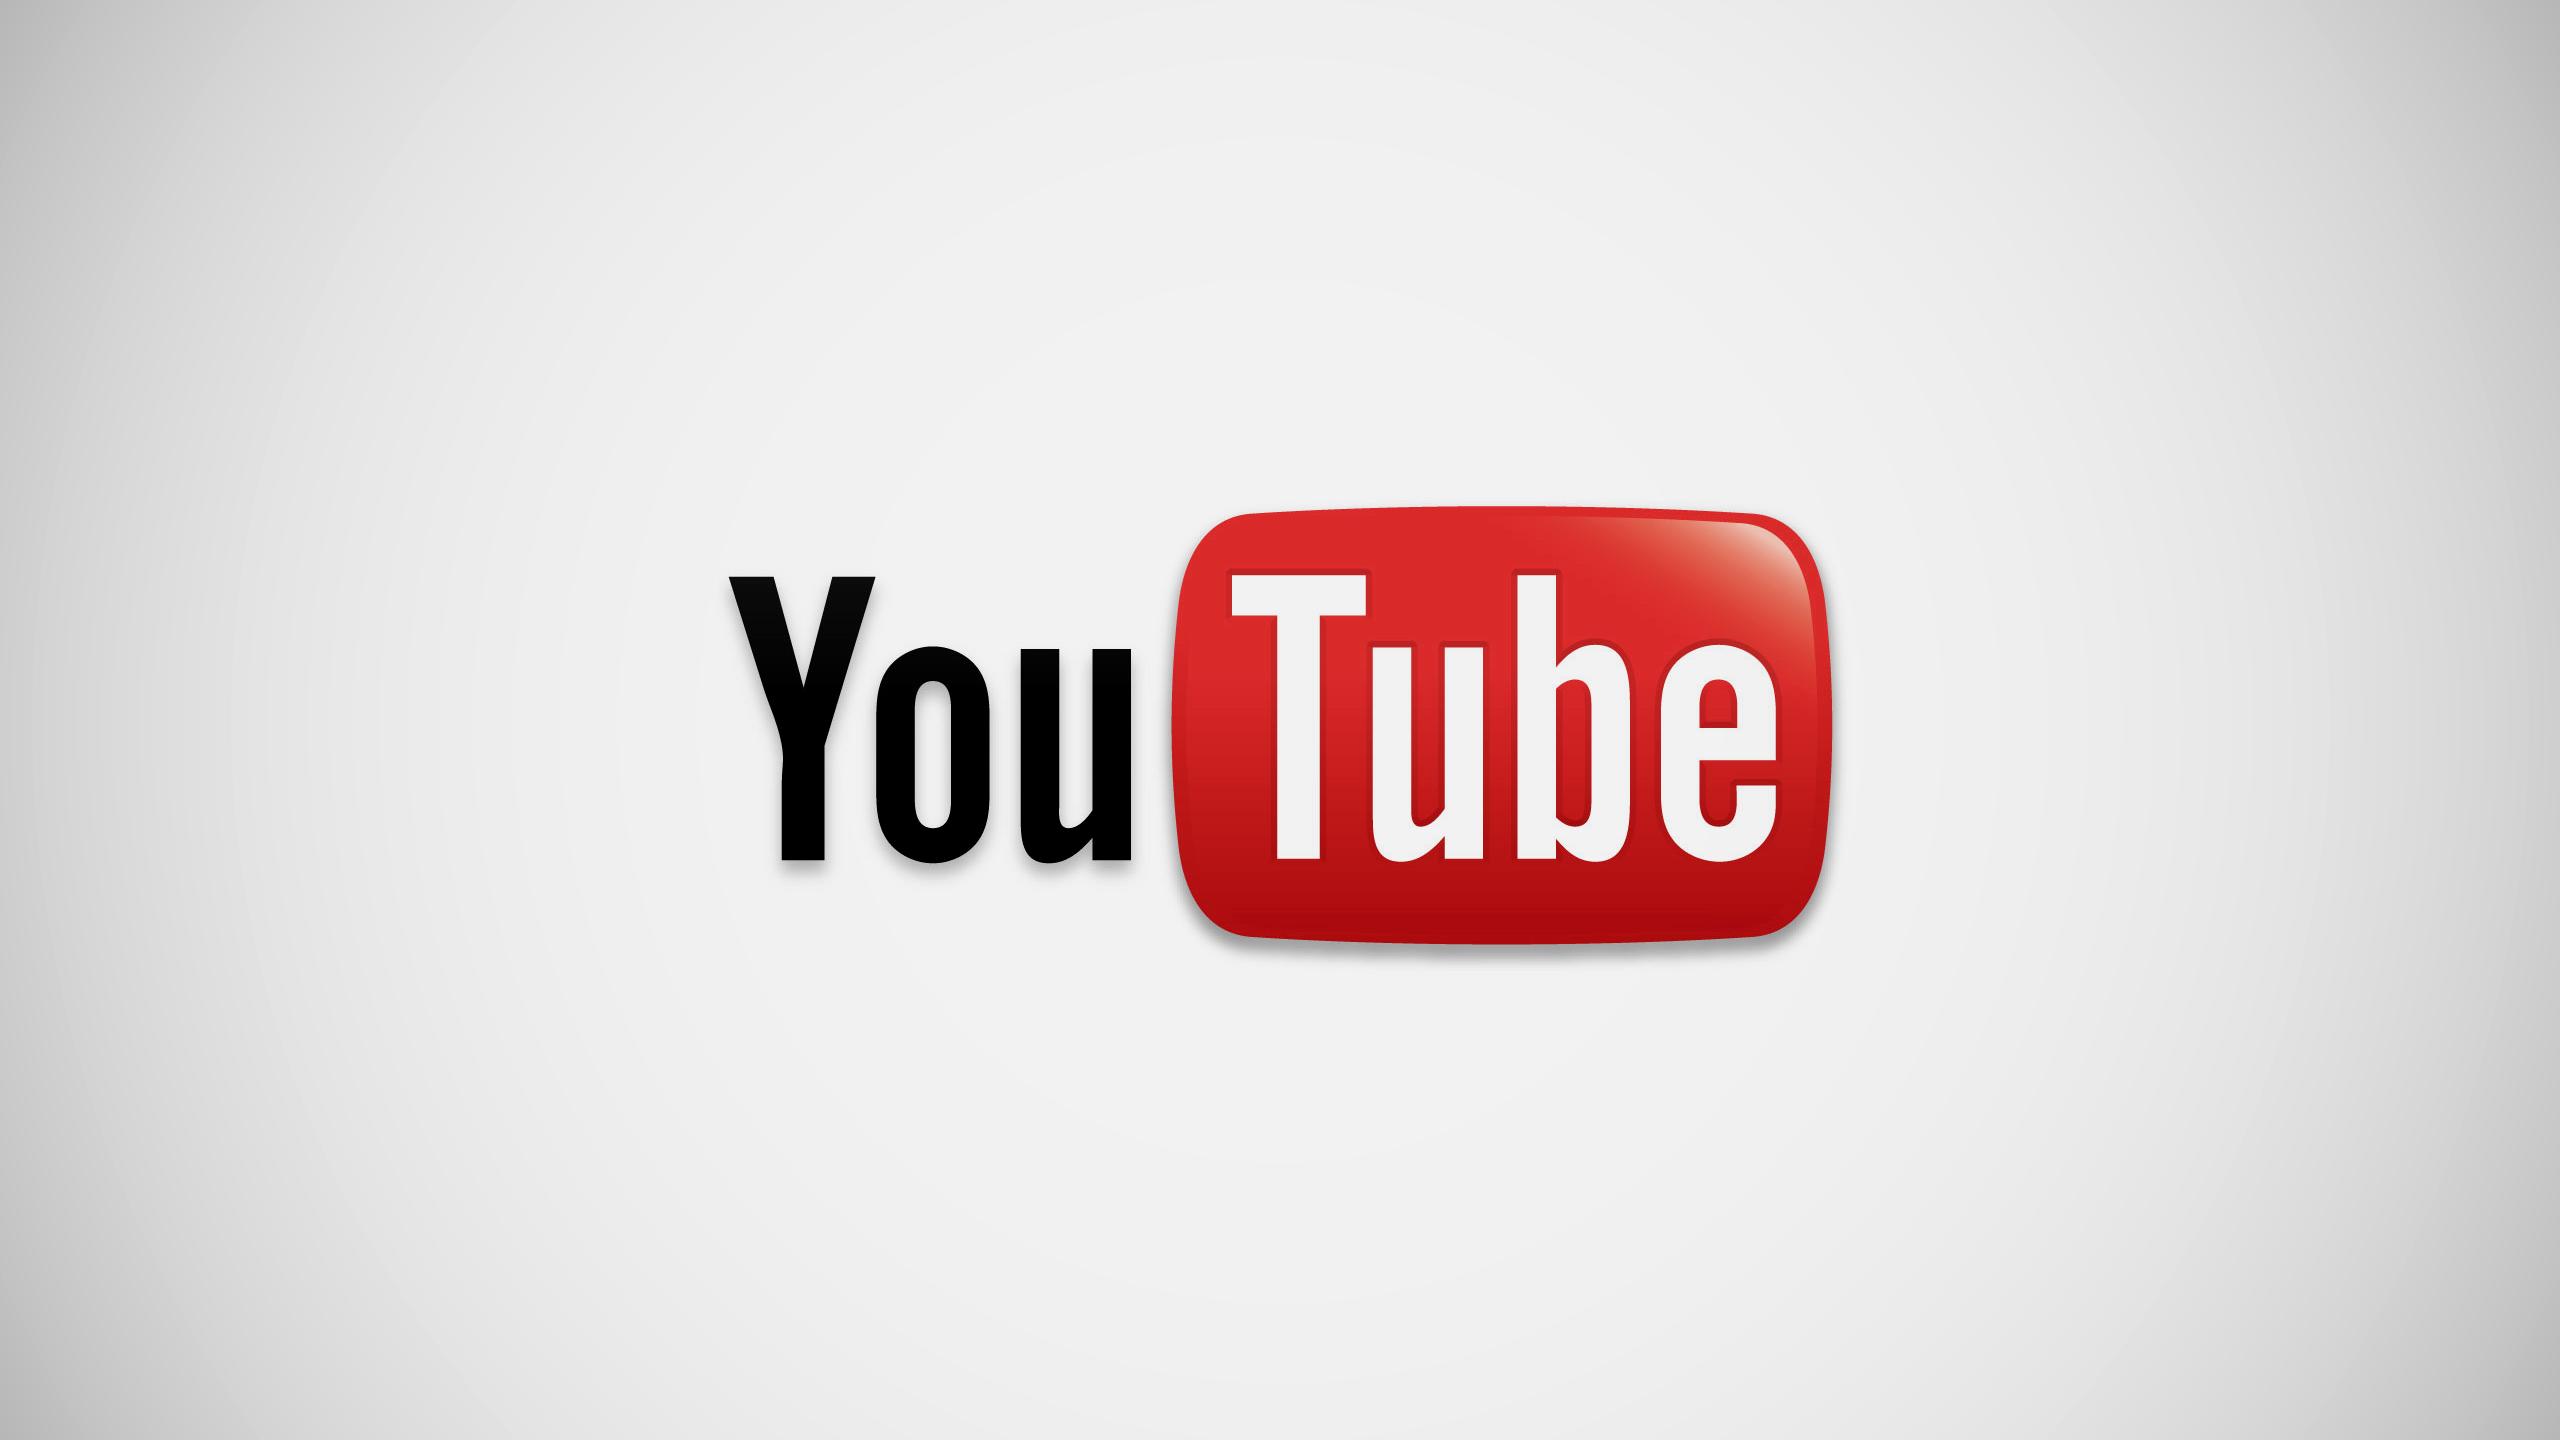 youtube_wallpaper_hd_2560x1440_by_sawyerthebest-d5z9km2